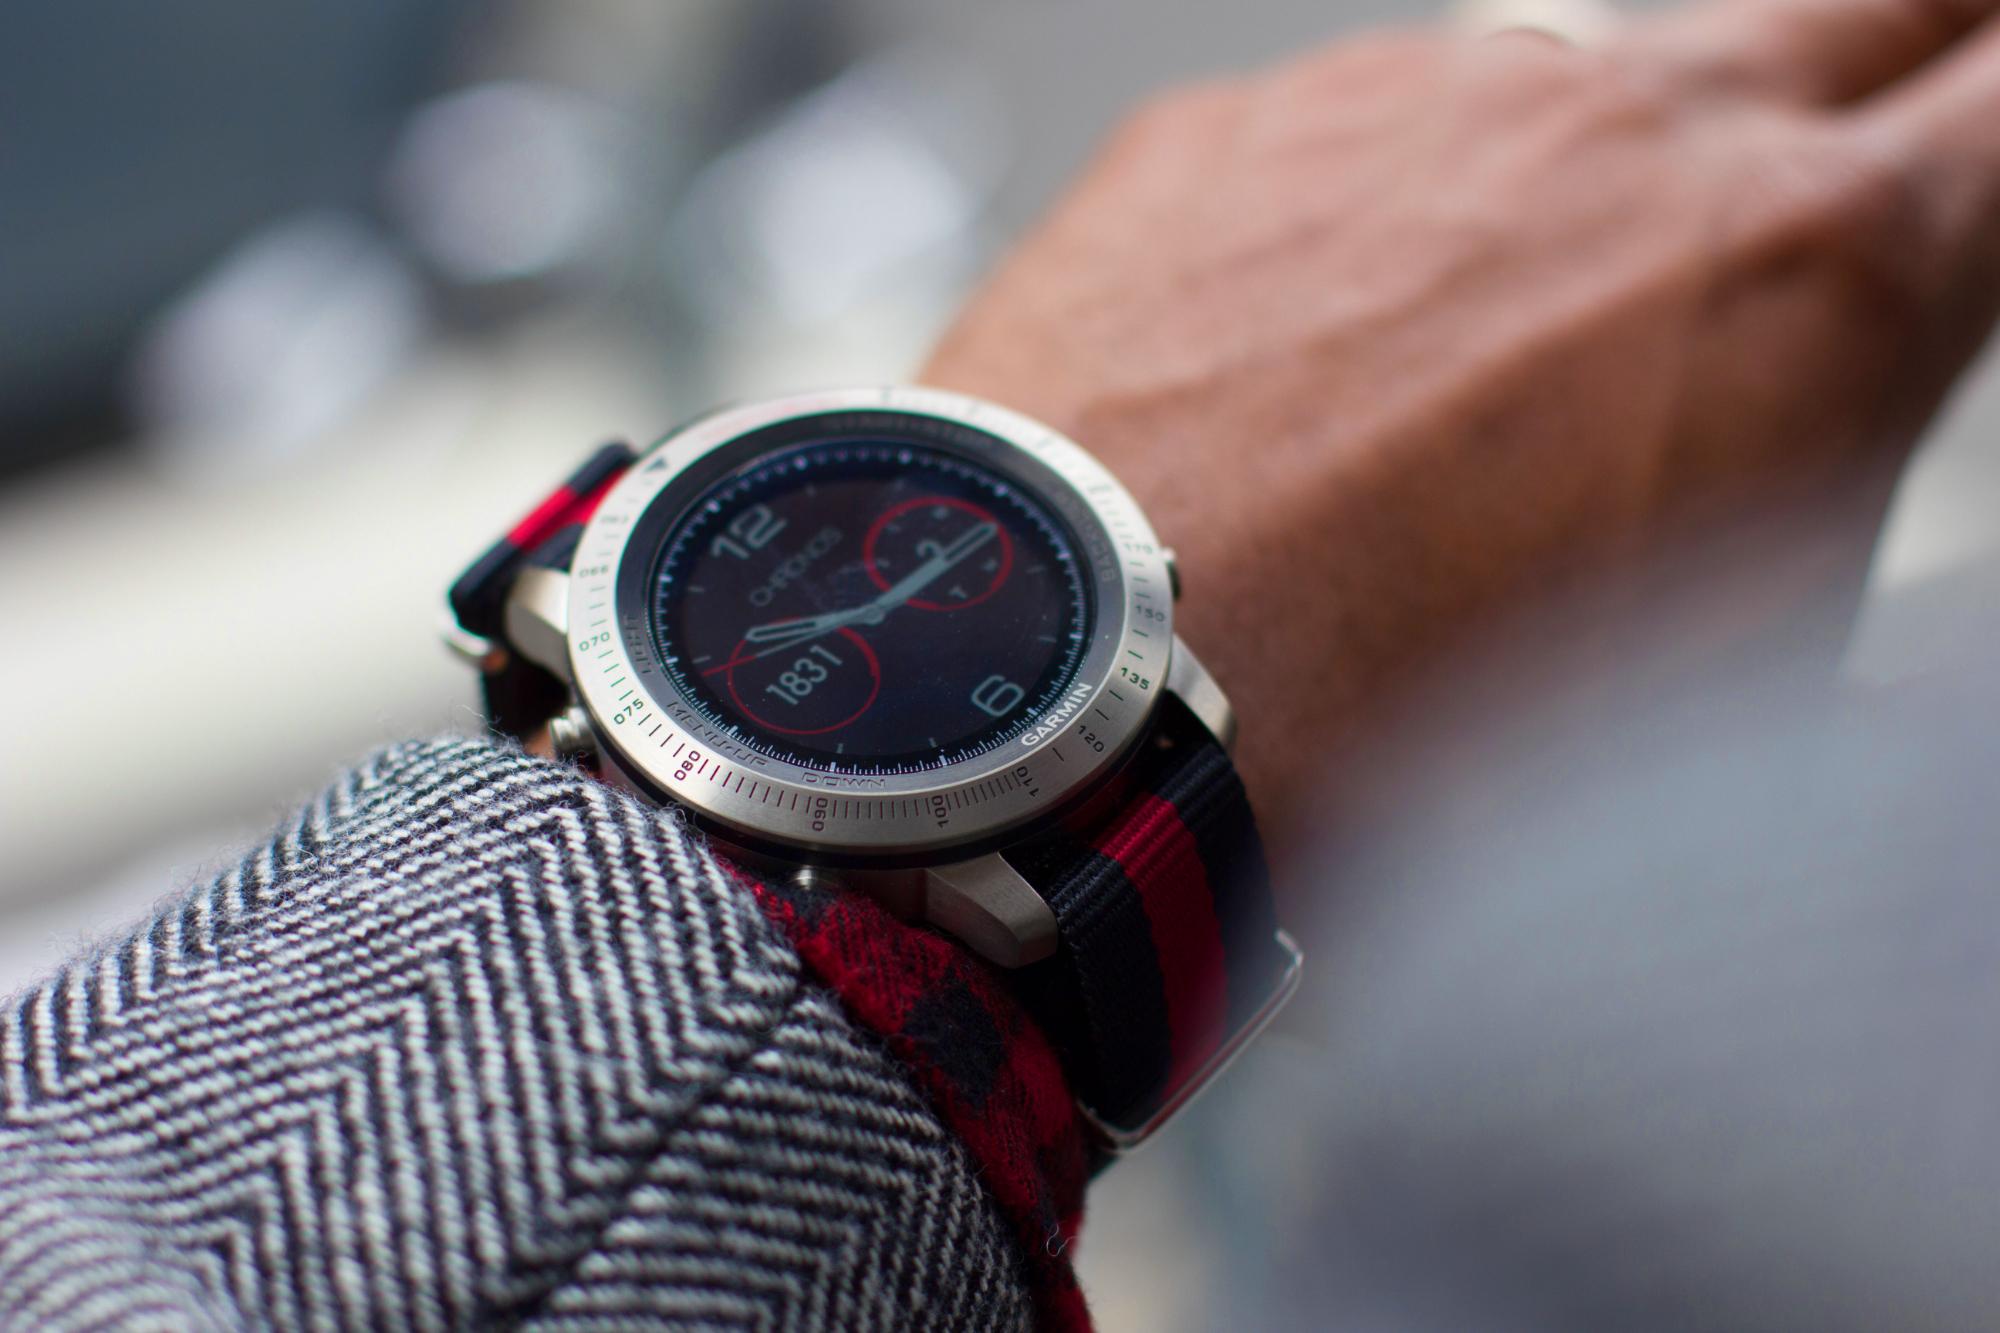 Sabir M. Peele of Men's Style Pro Fenix Chronos Garmin Smartwatch Review